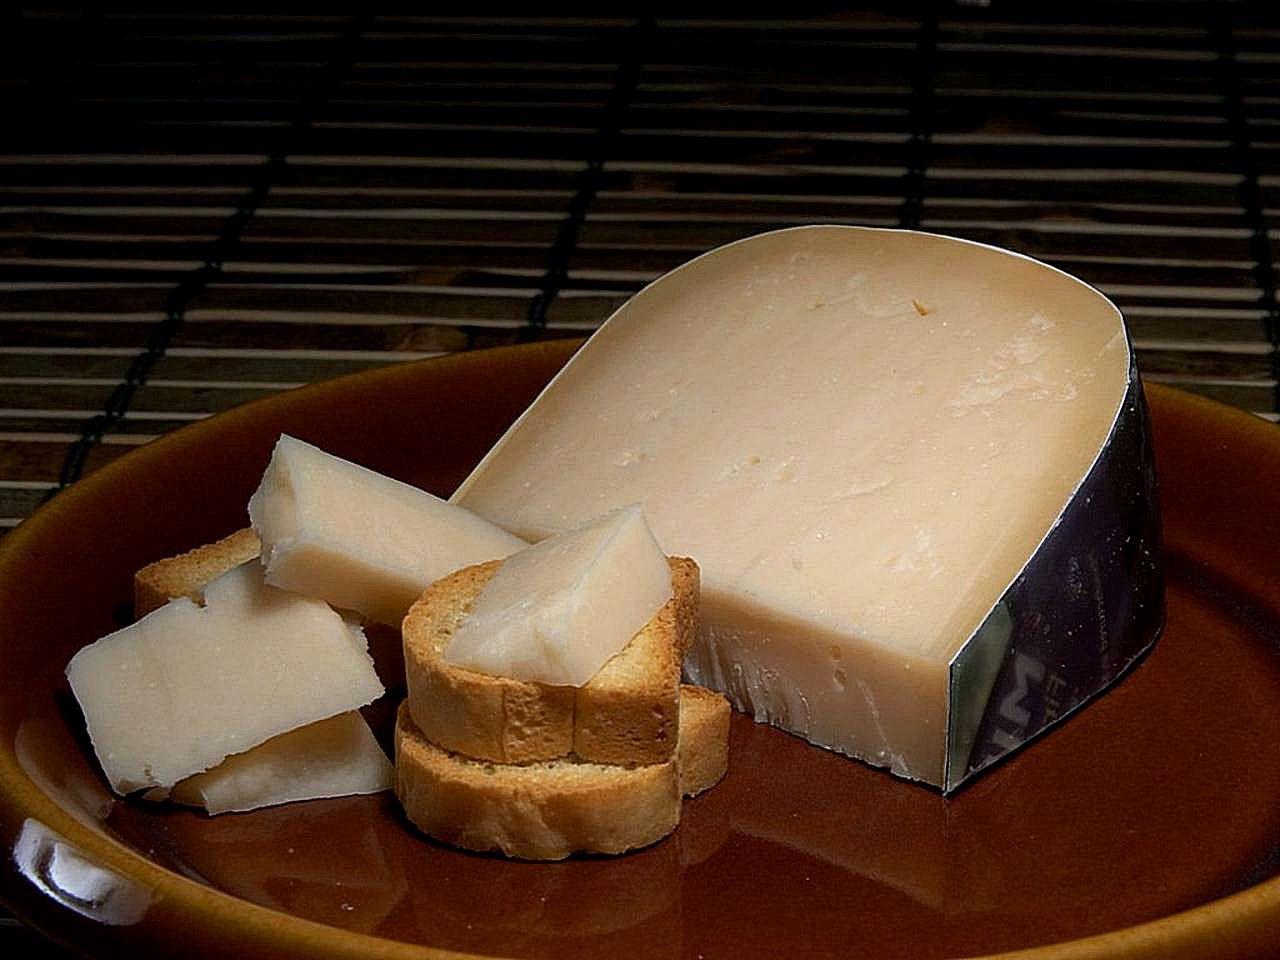 Midnight_moon_gouda_cheese